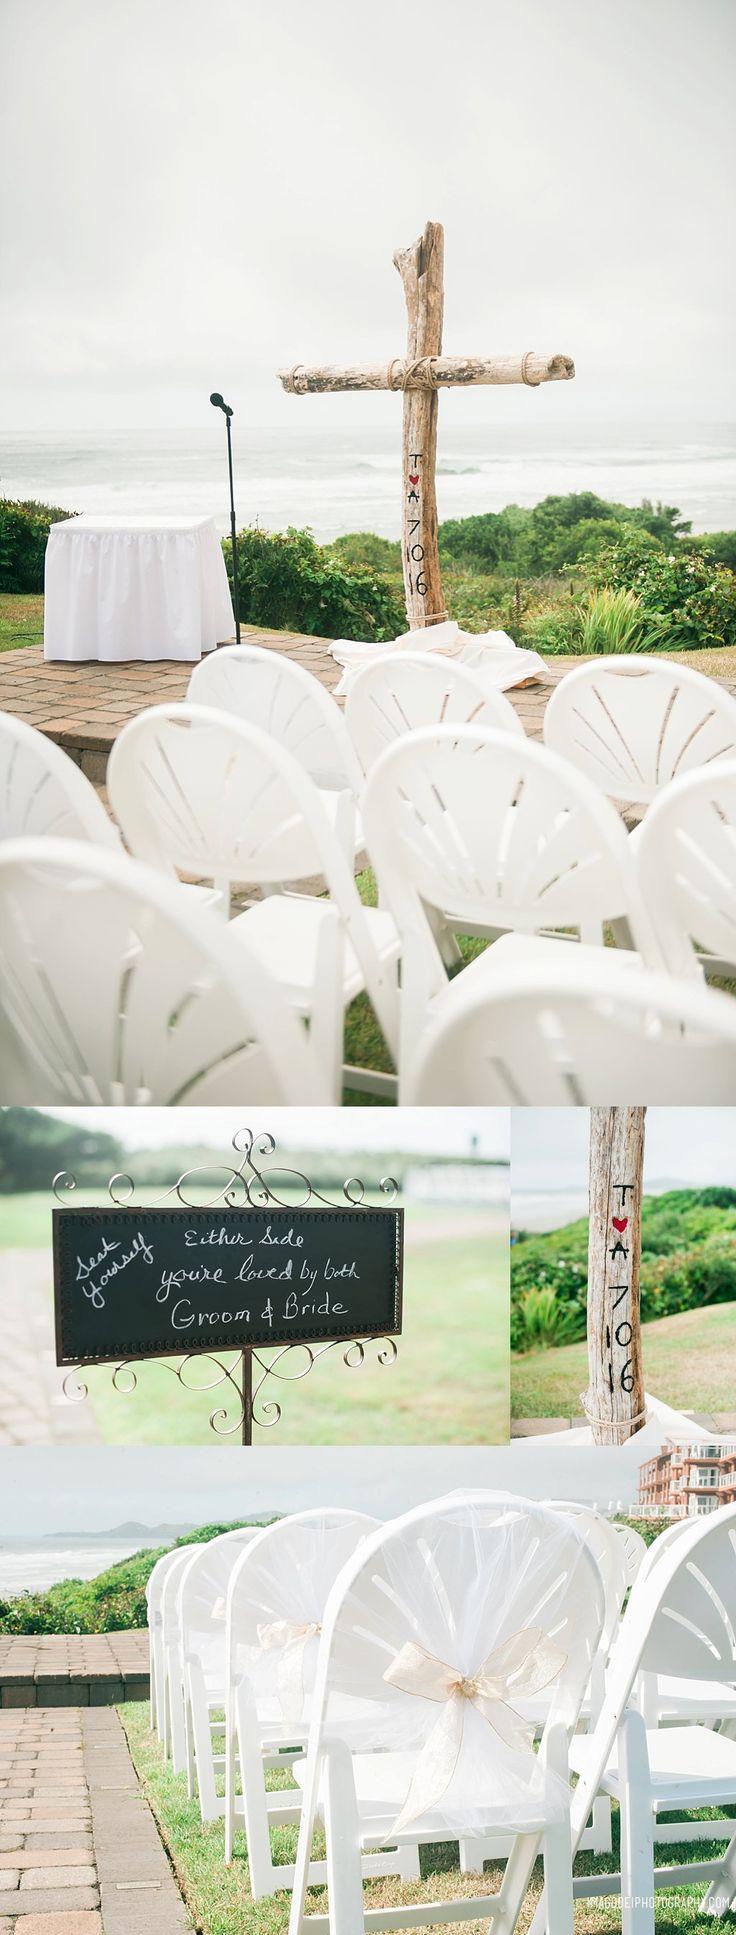 beach wedding places in california%0A  c f  c ce a b bbf    f c cd d  rusticcrossweddingdestinations jpg